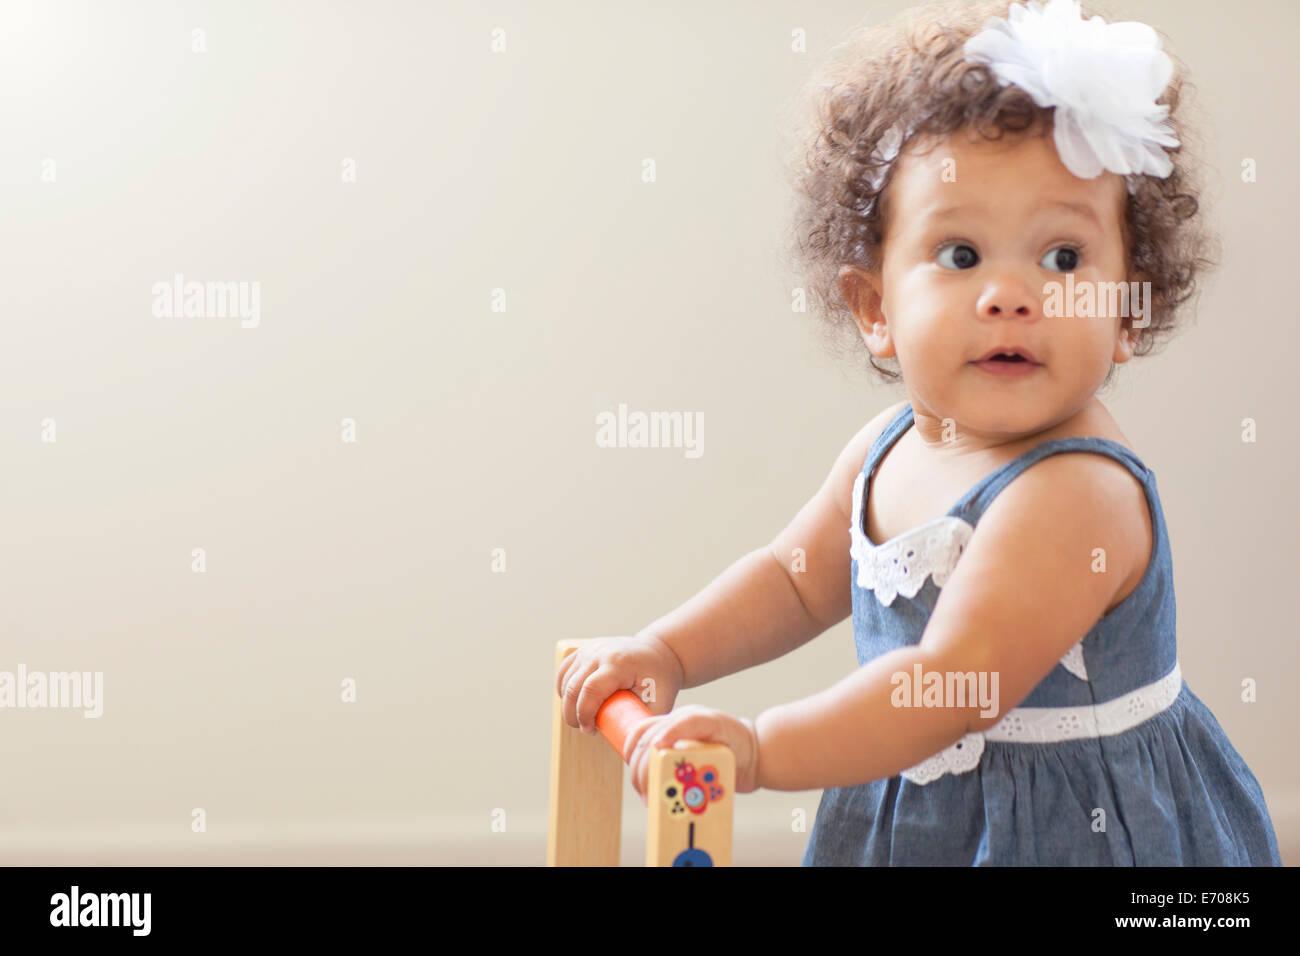 Portrait of baby girl, pushing baby walker - Stock Image